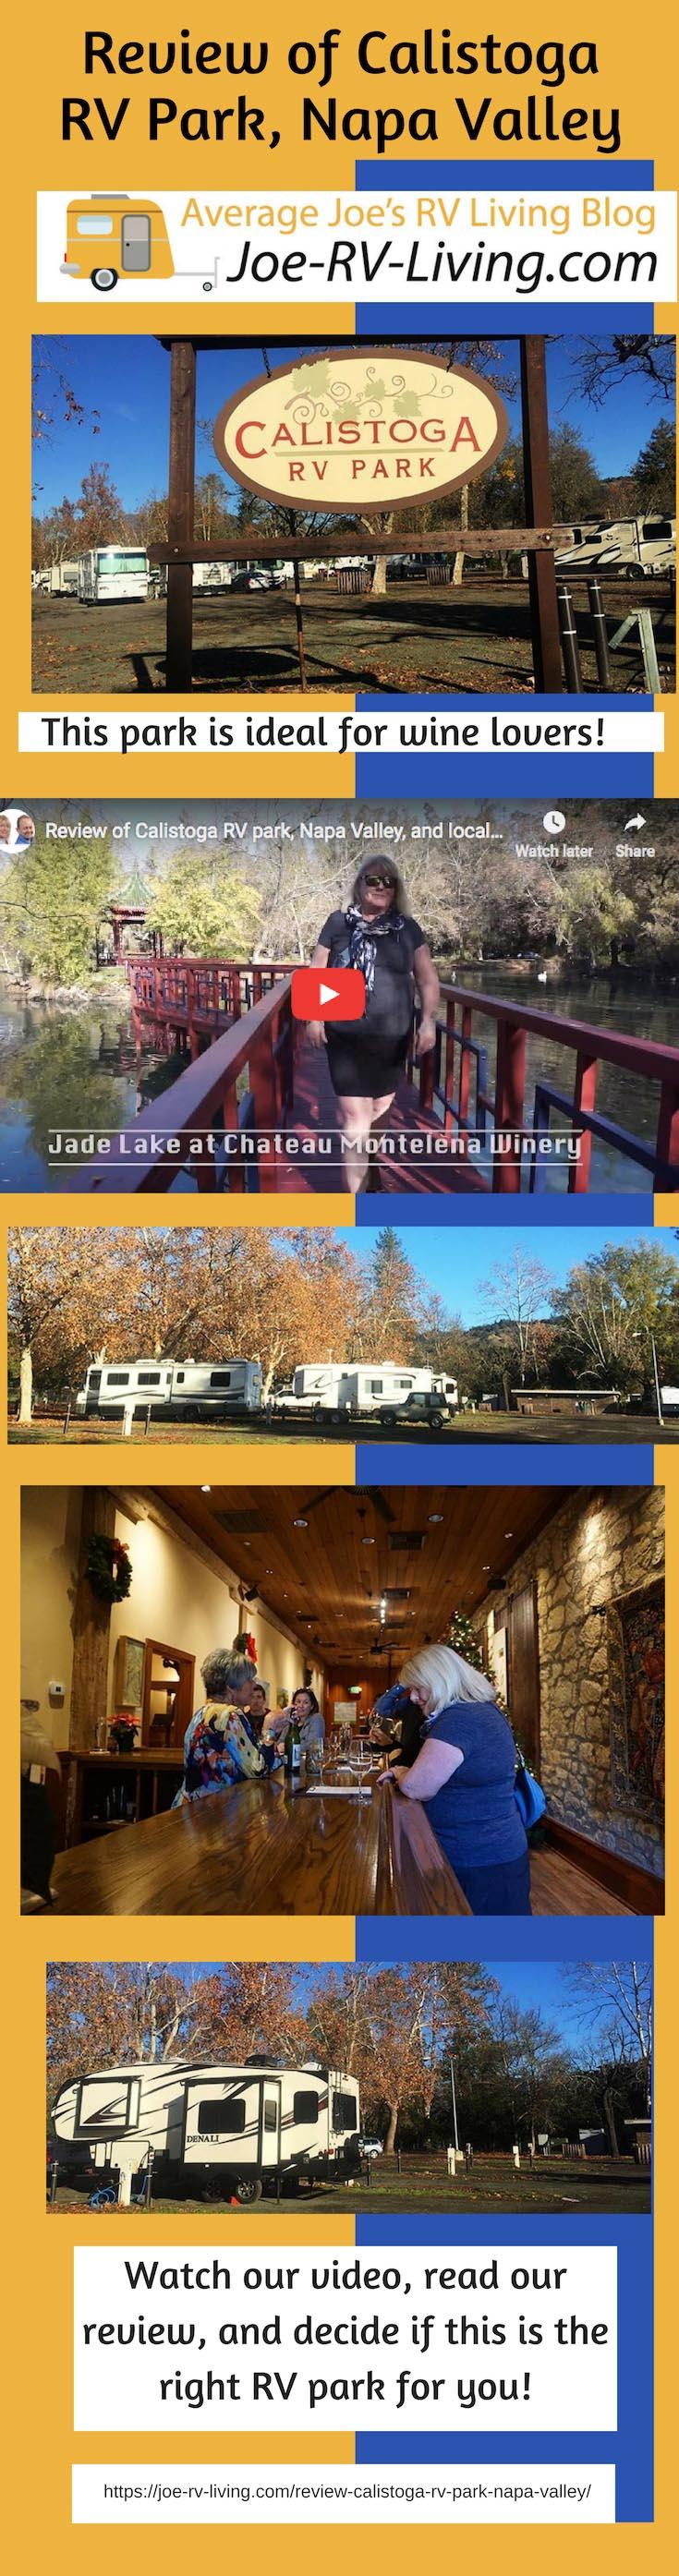 Review of Calistoga RV Park, Calistoga, Napa Valley, California